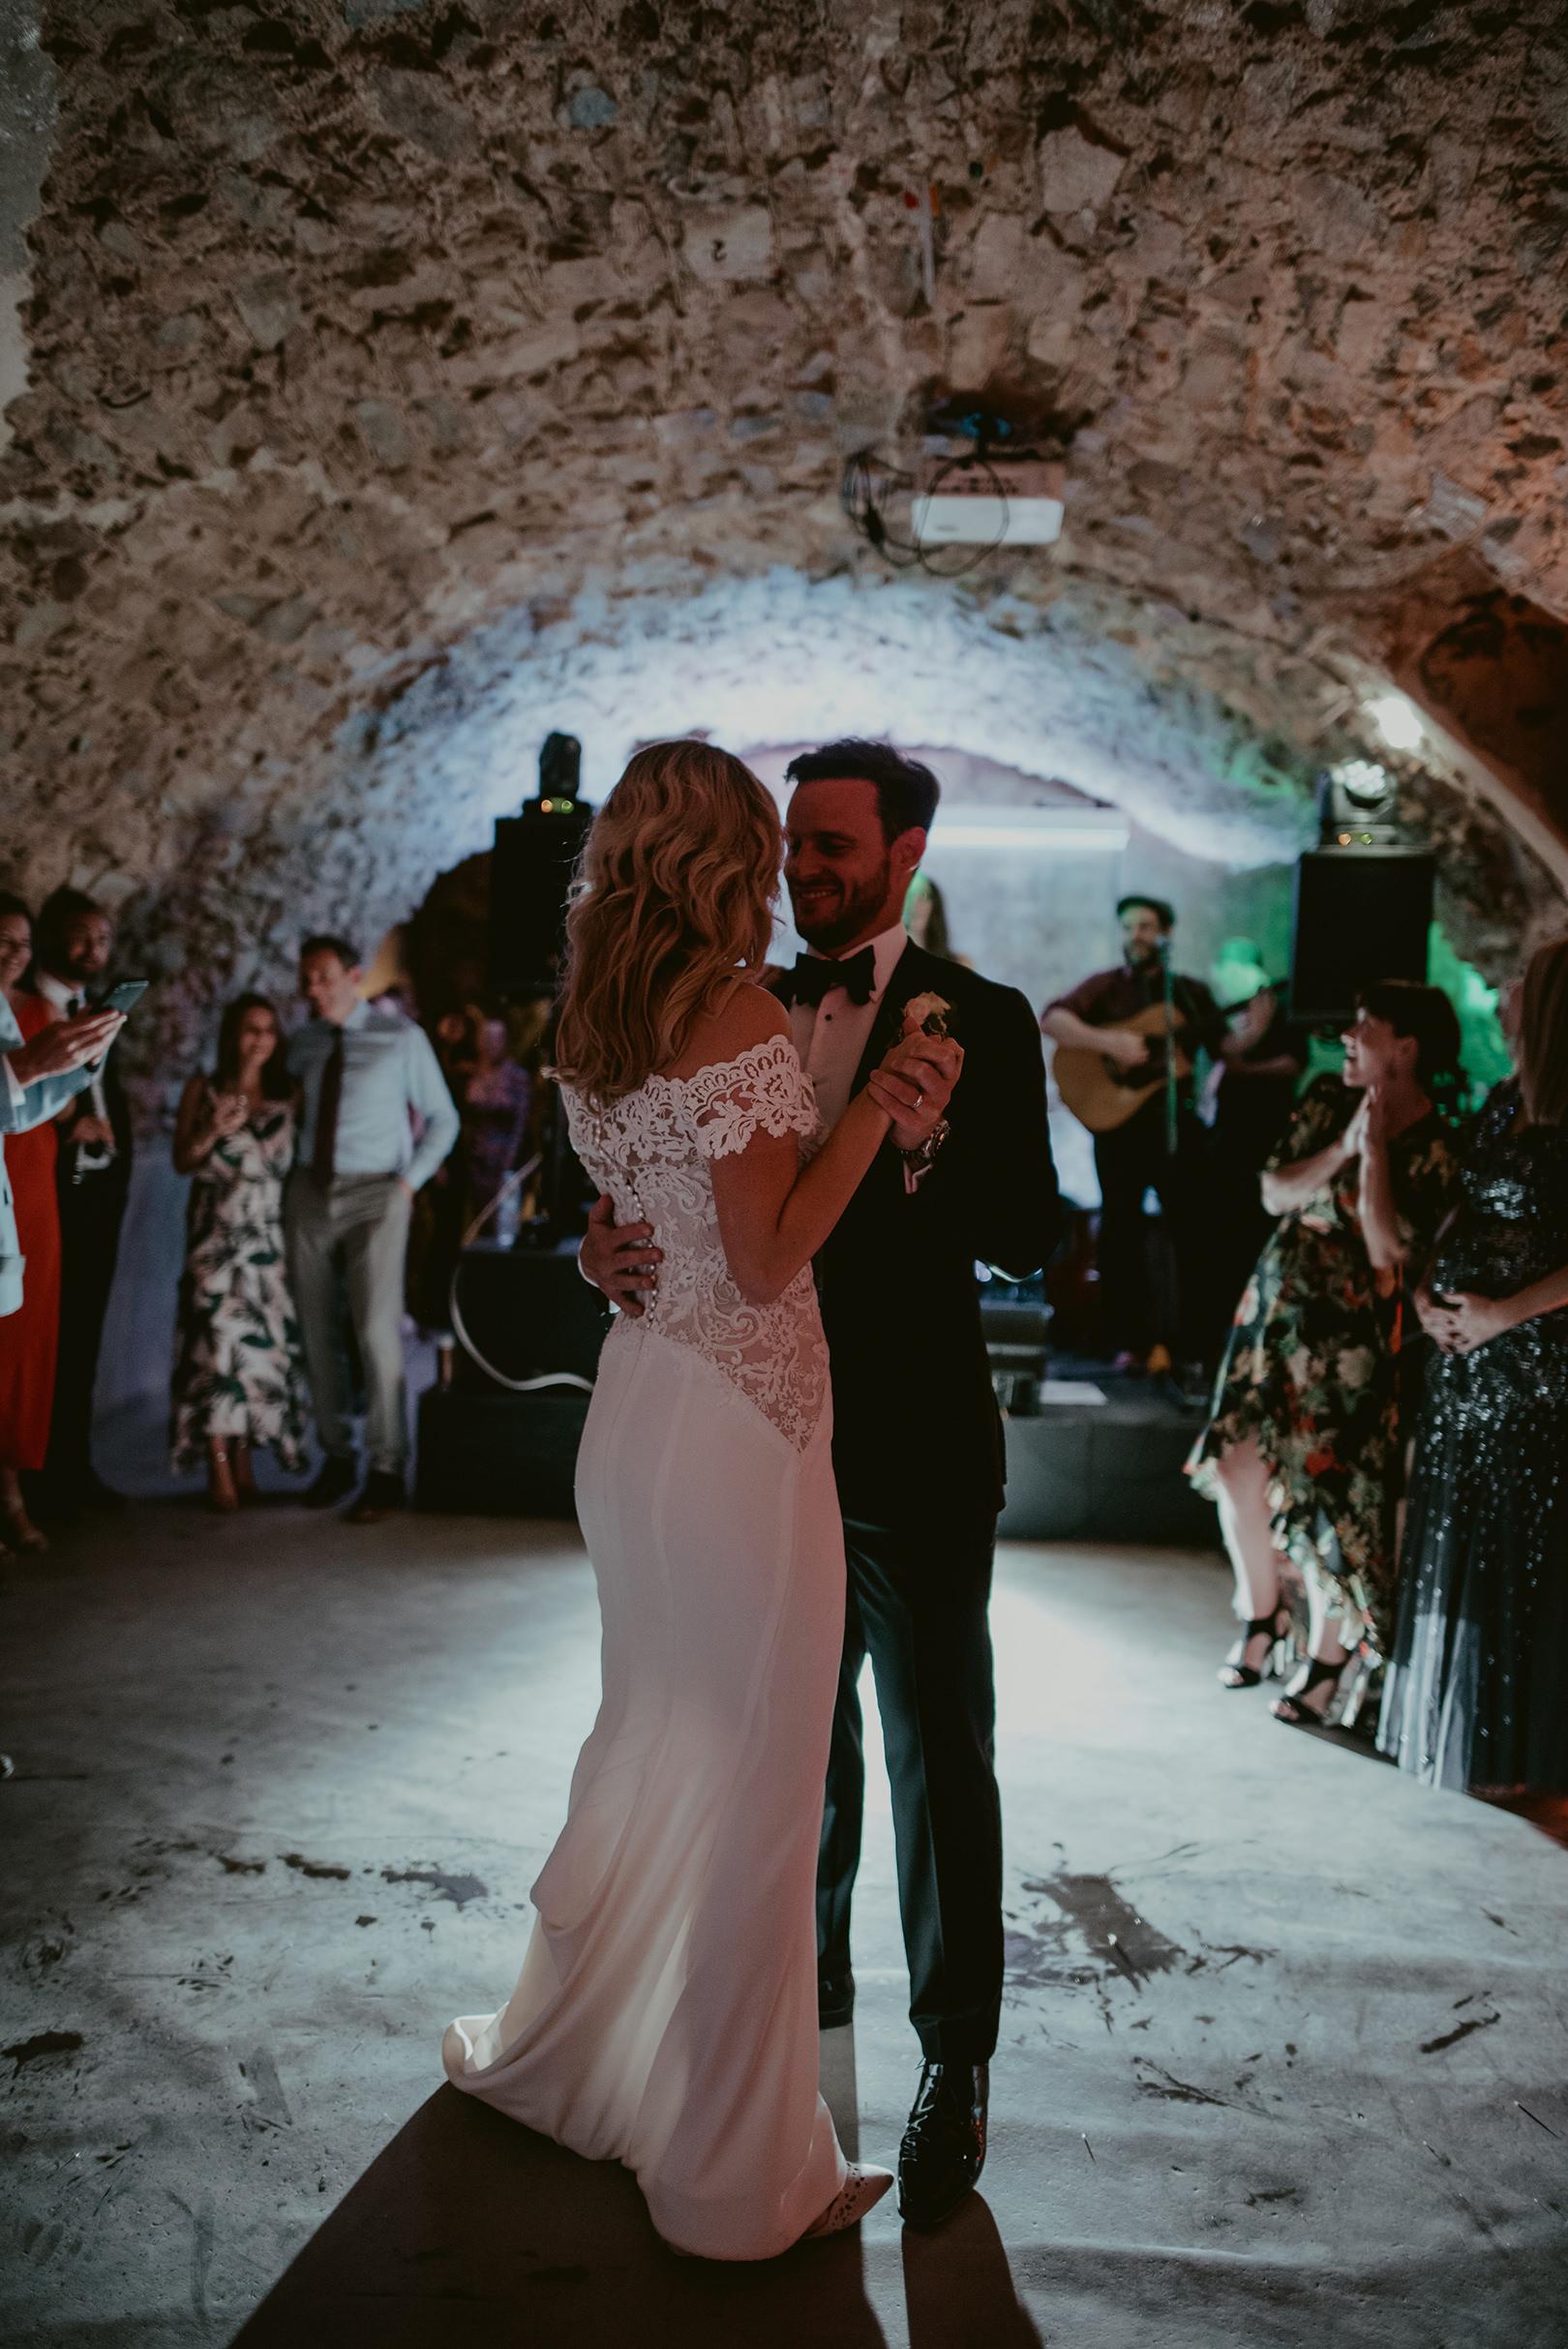 Celebrating wedding at Castell d'Emporda in Spain